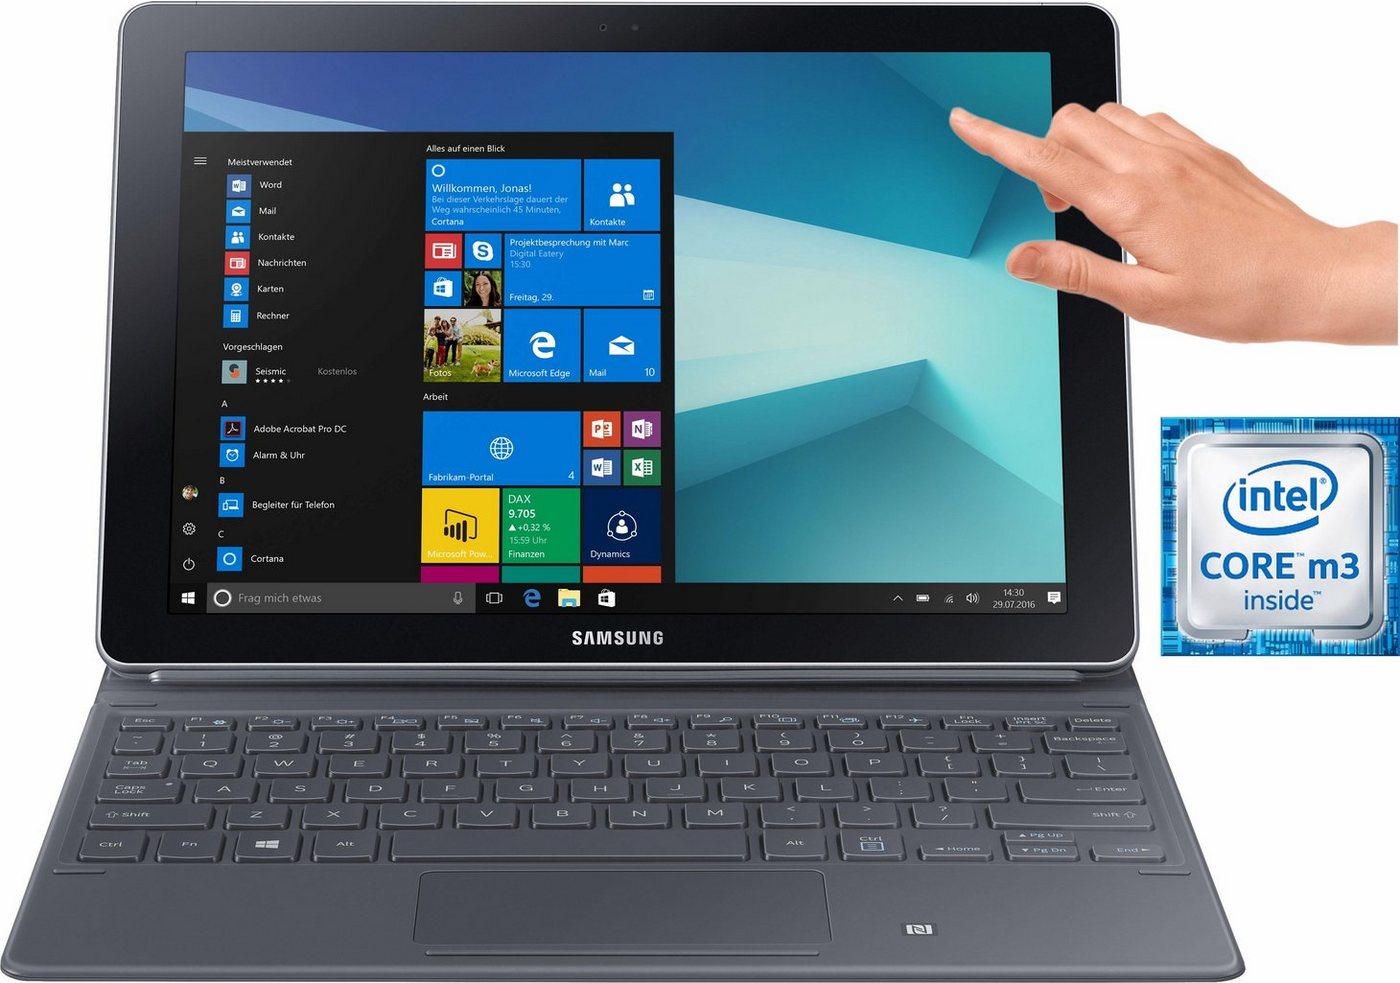 Samsung Galaxy Book 10.6 LTE Convertible Notebook (Intel Core m3)